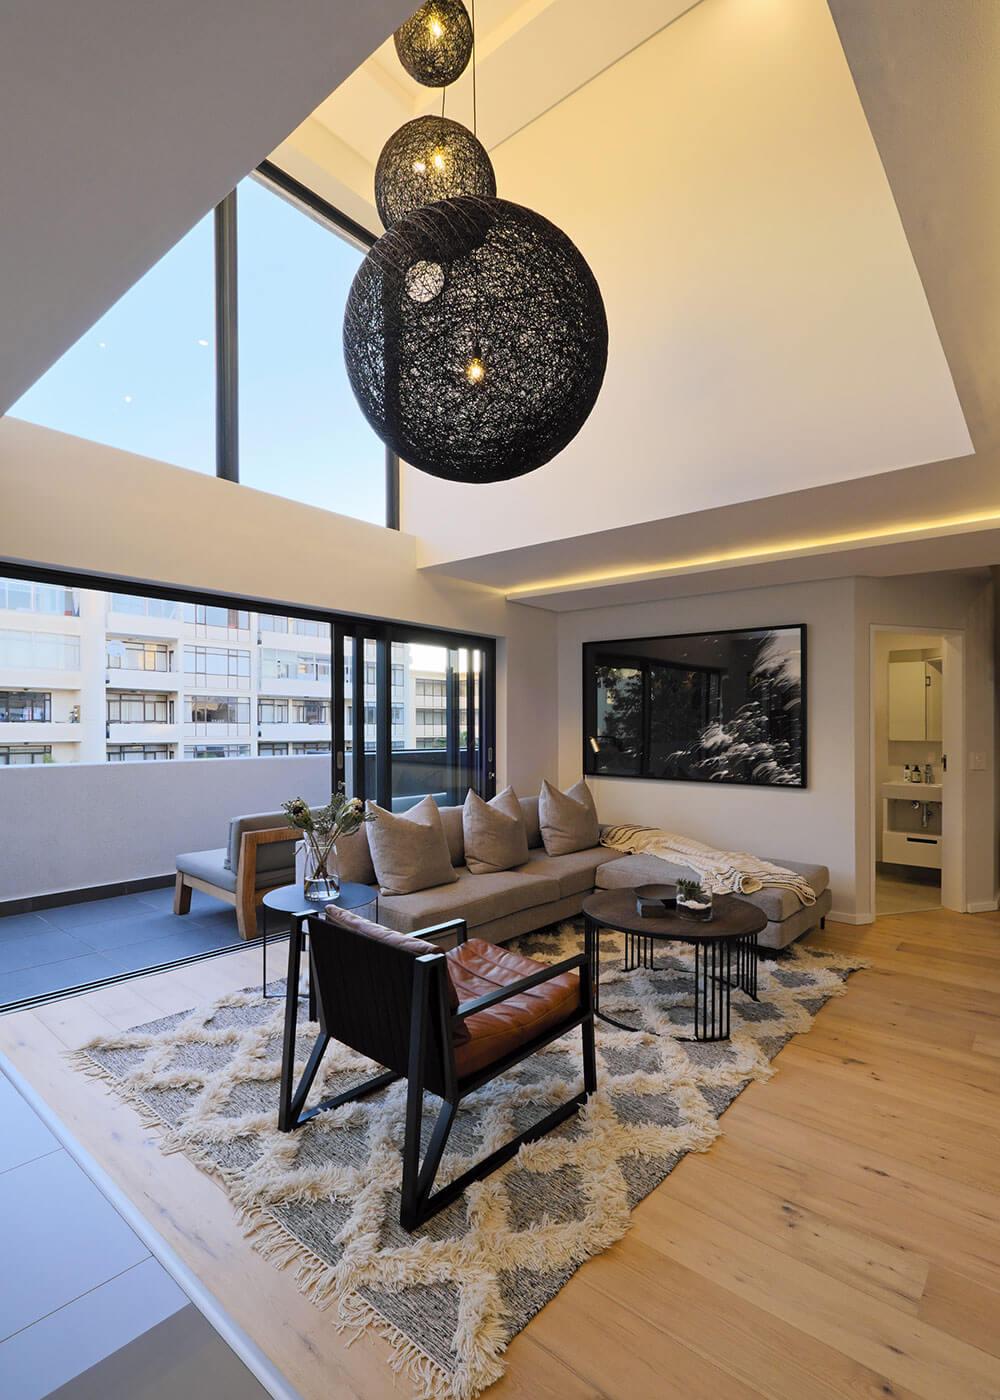 06 C10 - BLOK & Oggie hardwood flooring